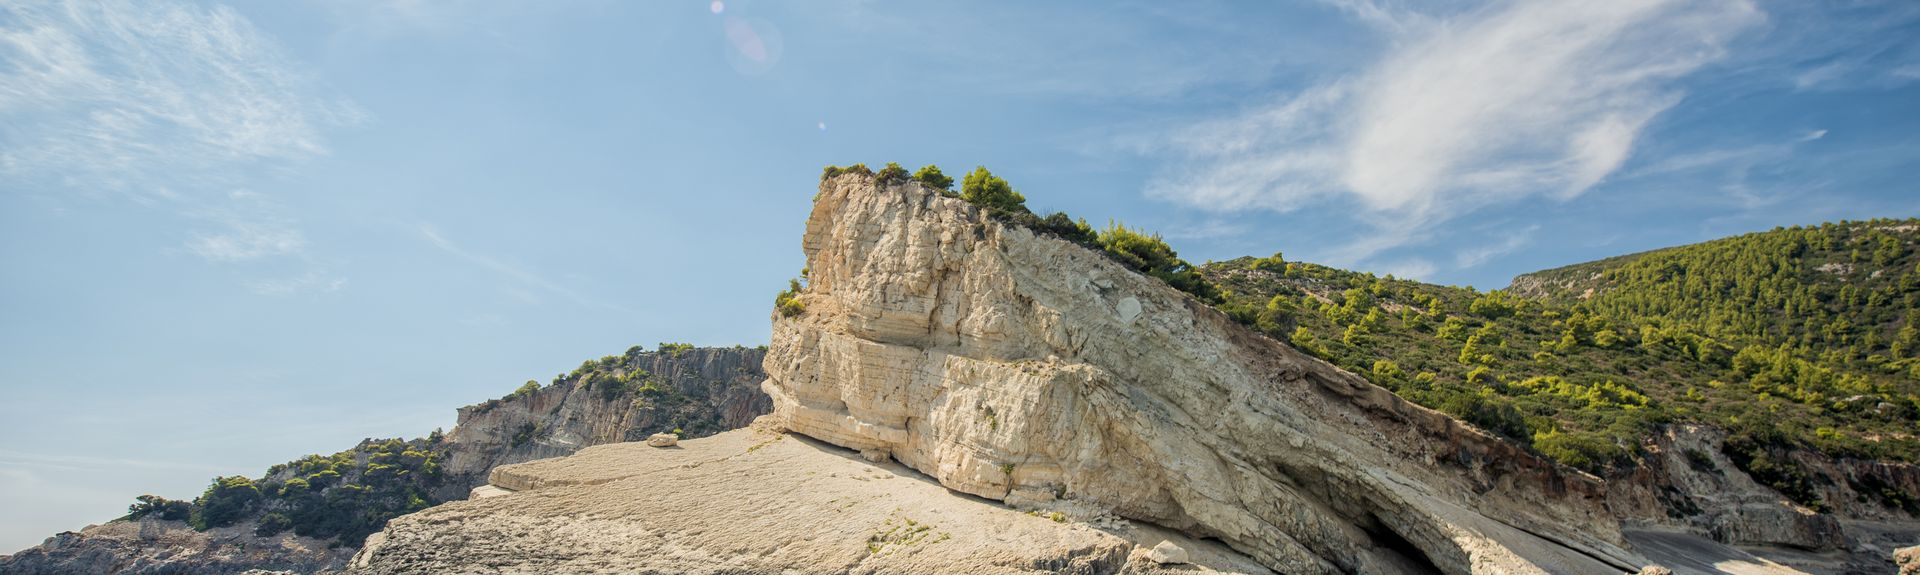 Kalamaki Beach, Kalamaki, Peloponnes, Hellas